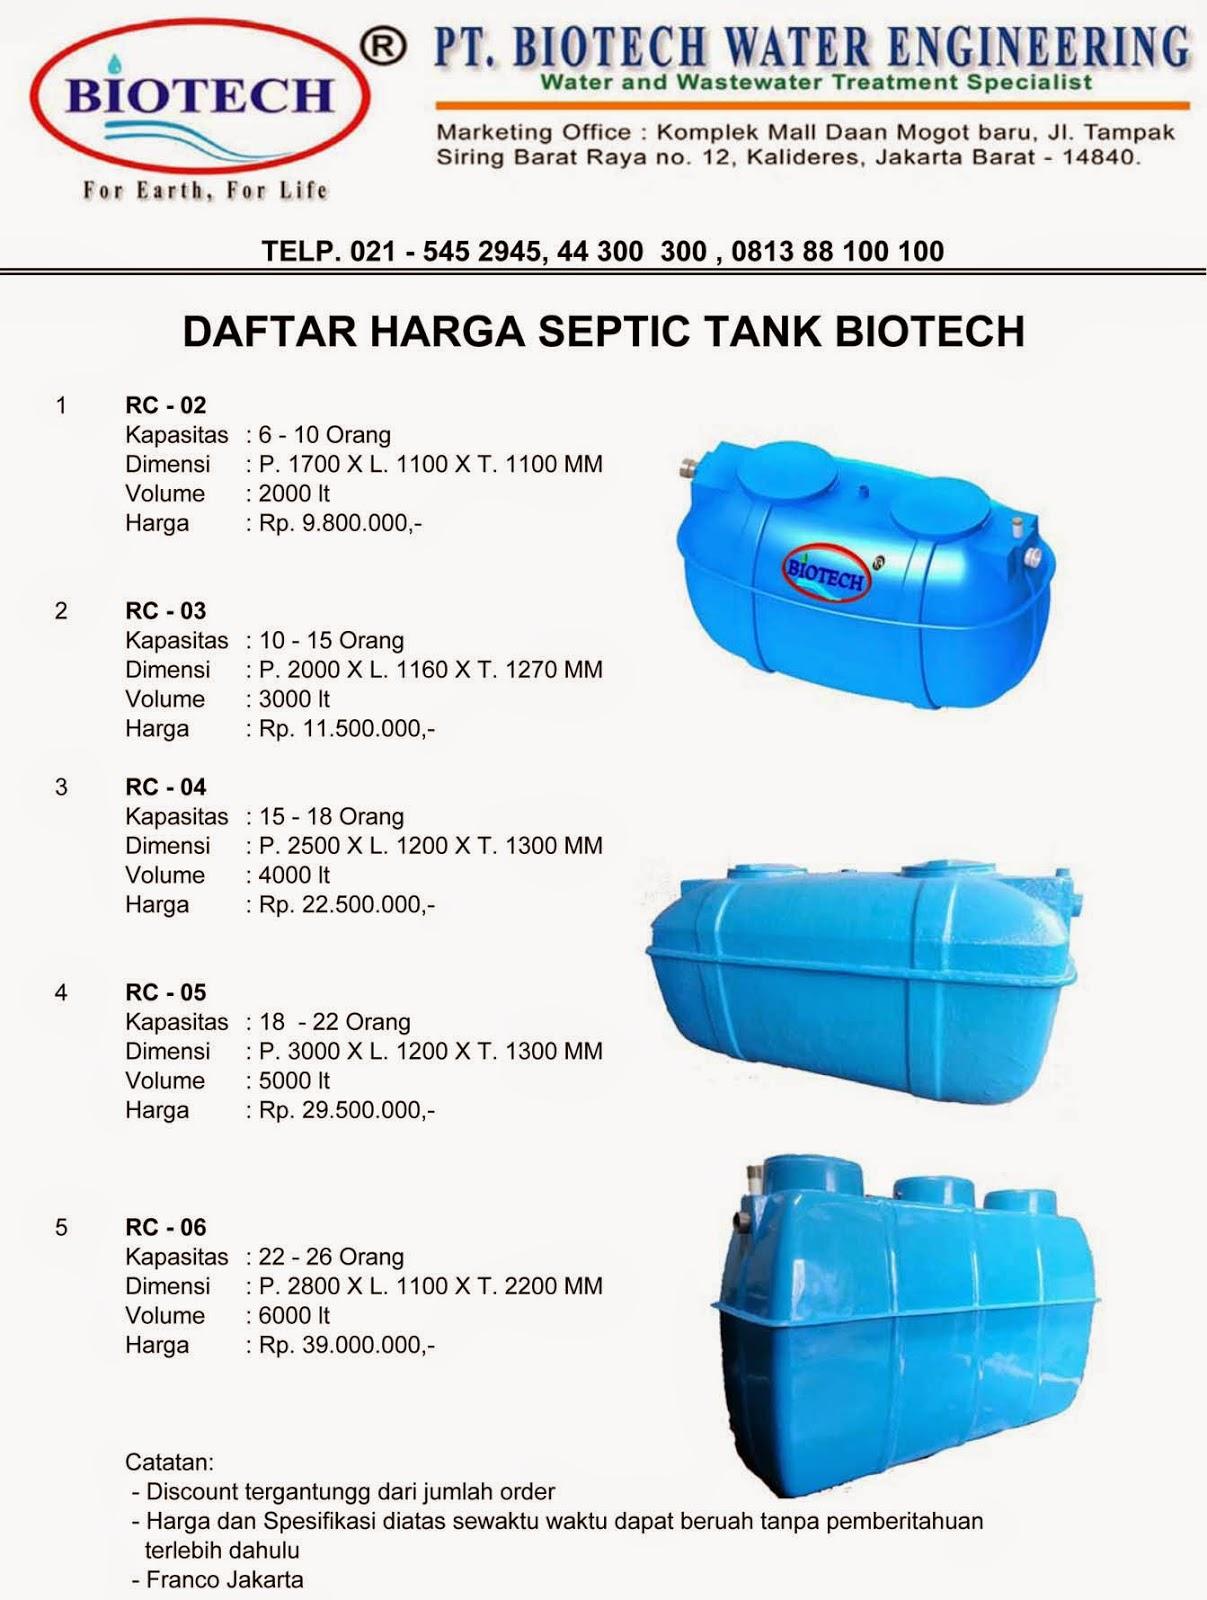 daftar harga septic tank biotech RC series, price list spiteng biotek, jual, biofive, biogift